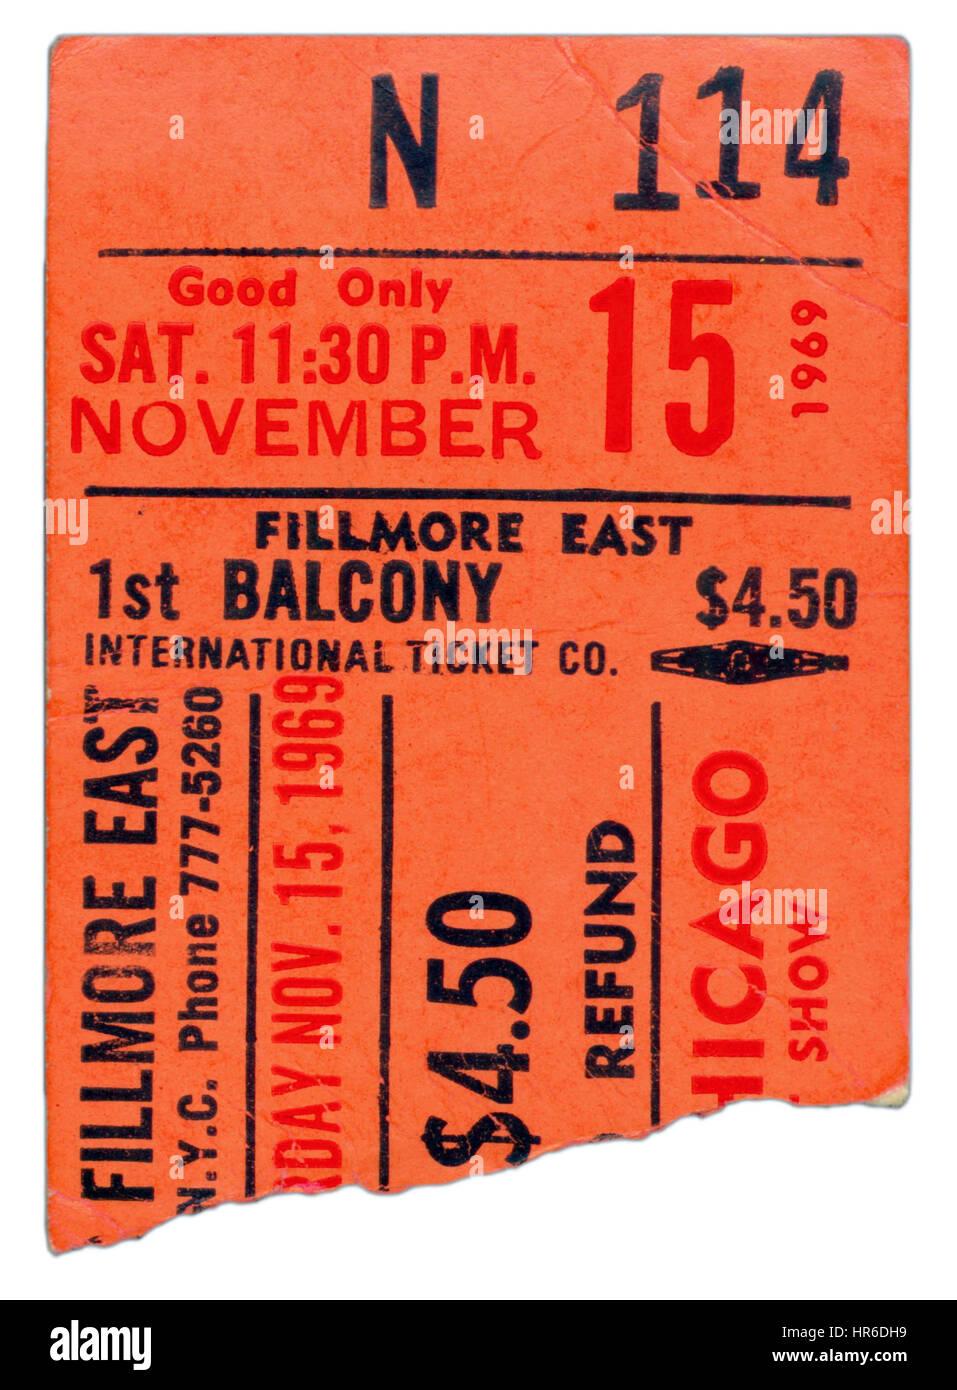 Concert Ticket Stub Stockfotos & Concert Ticket Stub Bilder - Alamy